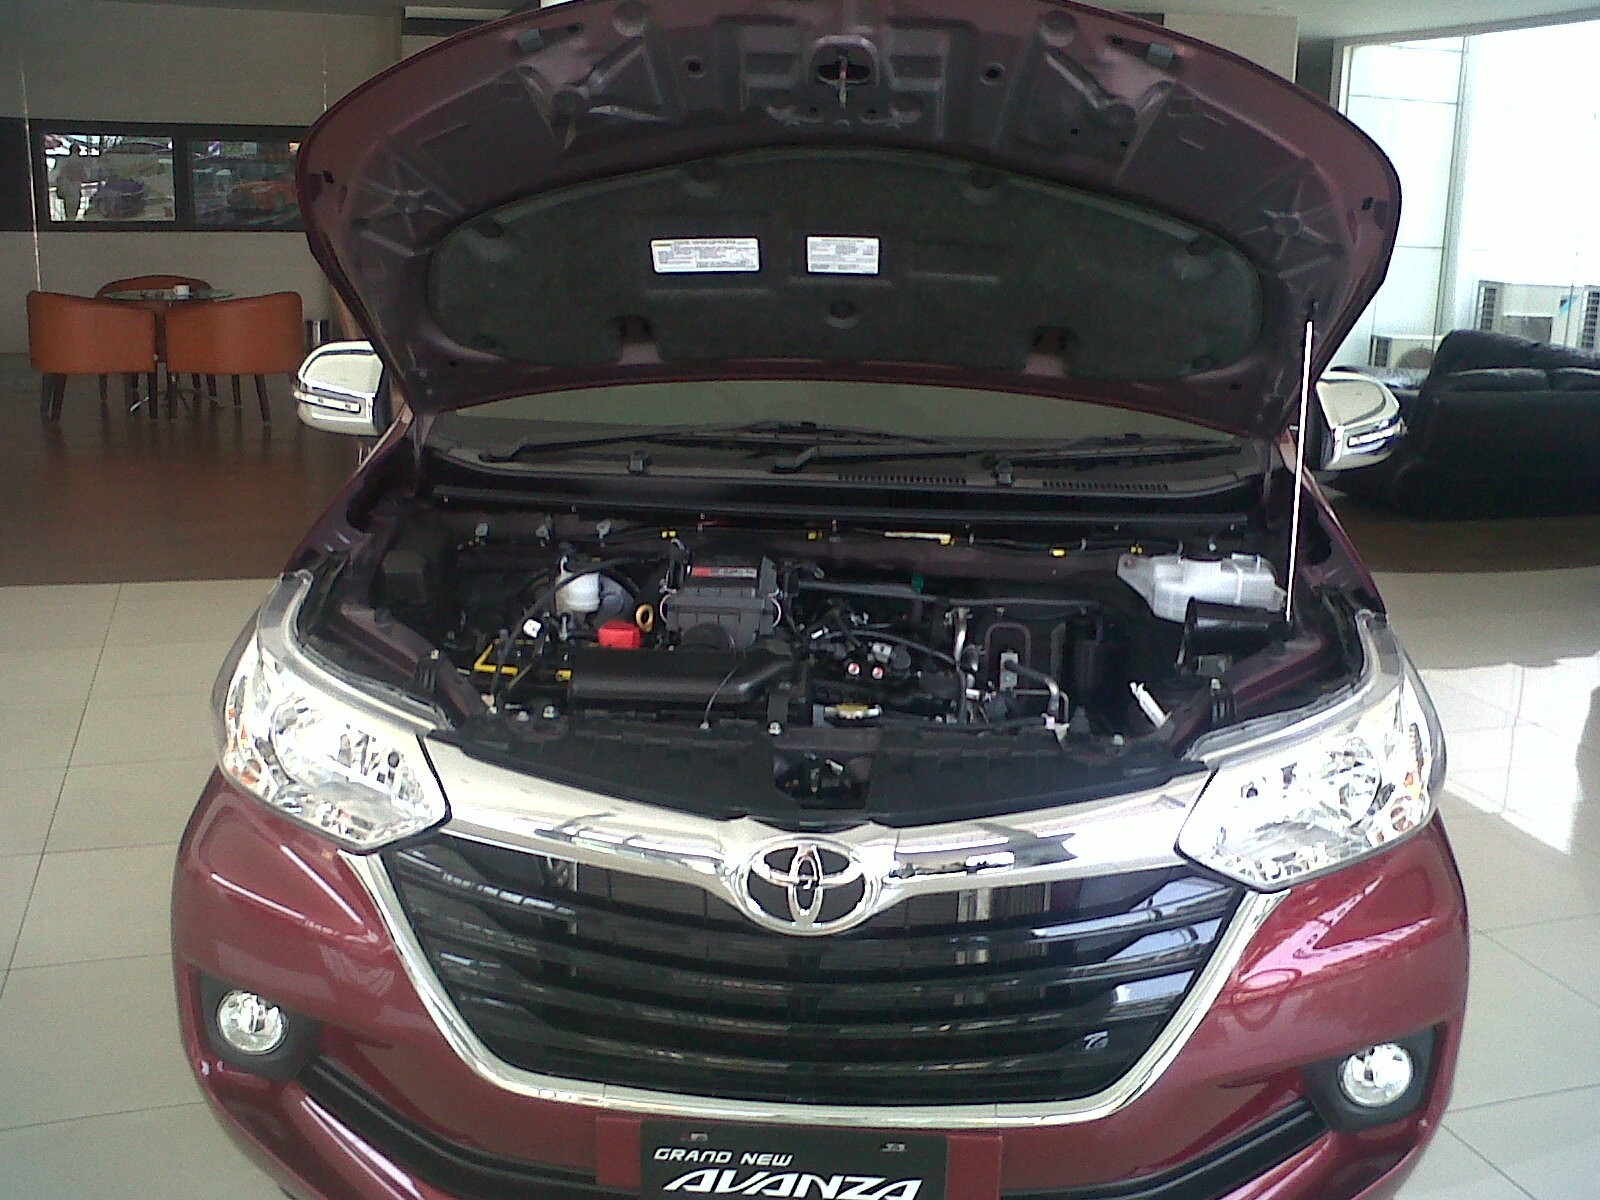 Grand New Avanza 2015 Type E Agya 1.2 Trd Silver Toyota Cash Credit Or Trade In 1 3 G 5 Veloz Dan Kecuali Sudah Dilengkapi Sistem Pengereman Abs Anti Lock Braking Proteksi